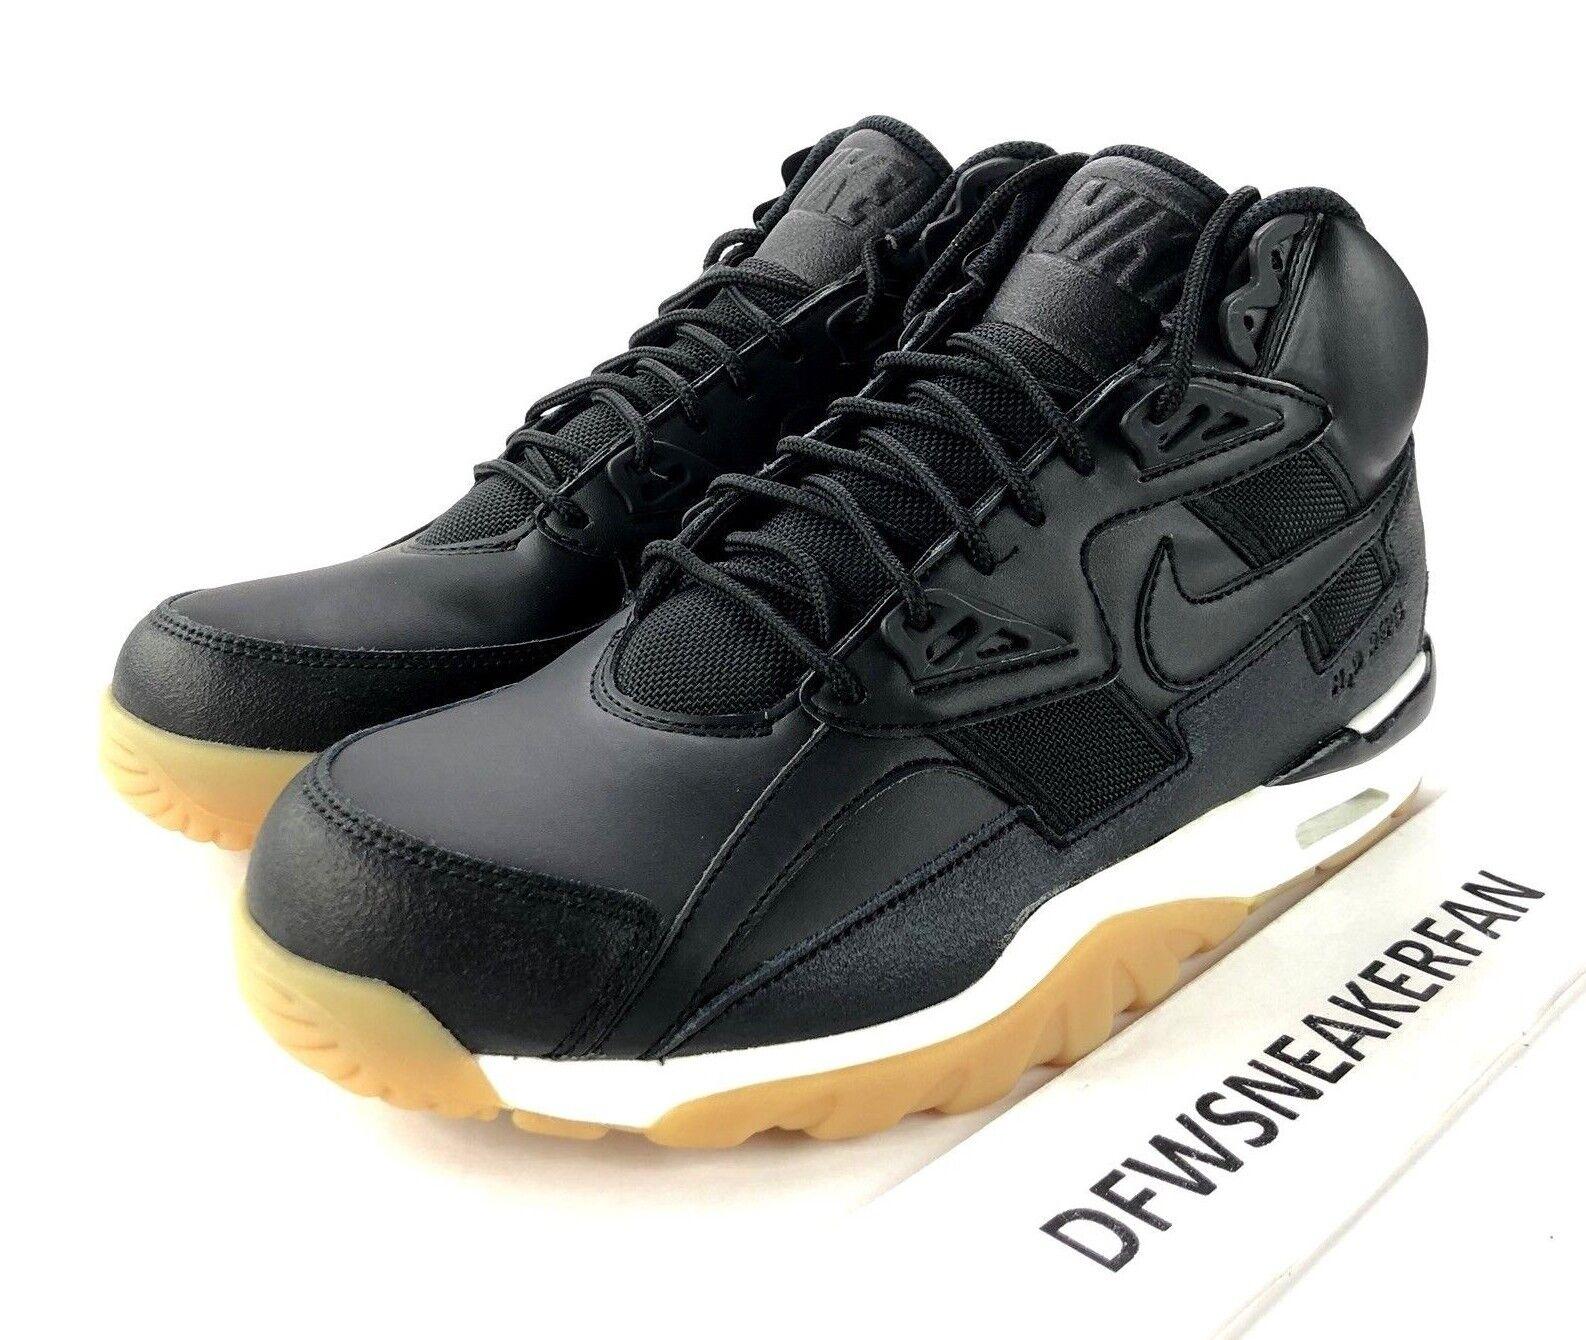 fd26a8f1eb829 ... new arrivals nike air 10 trainer sc mens size 10 air winter shoes black  sail white